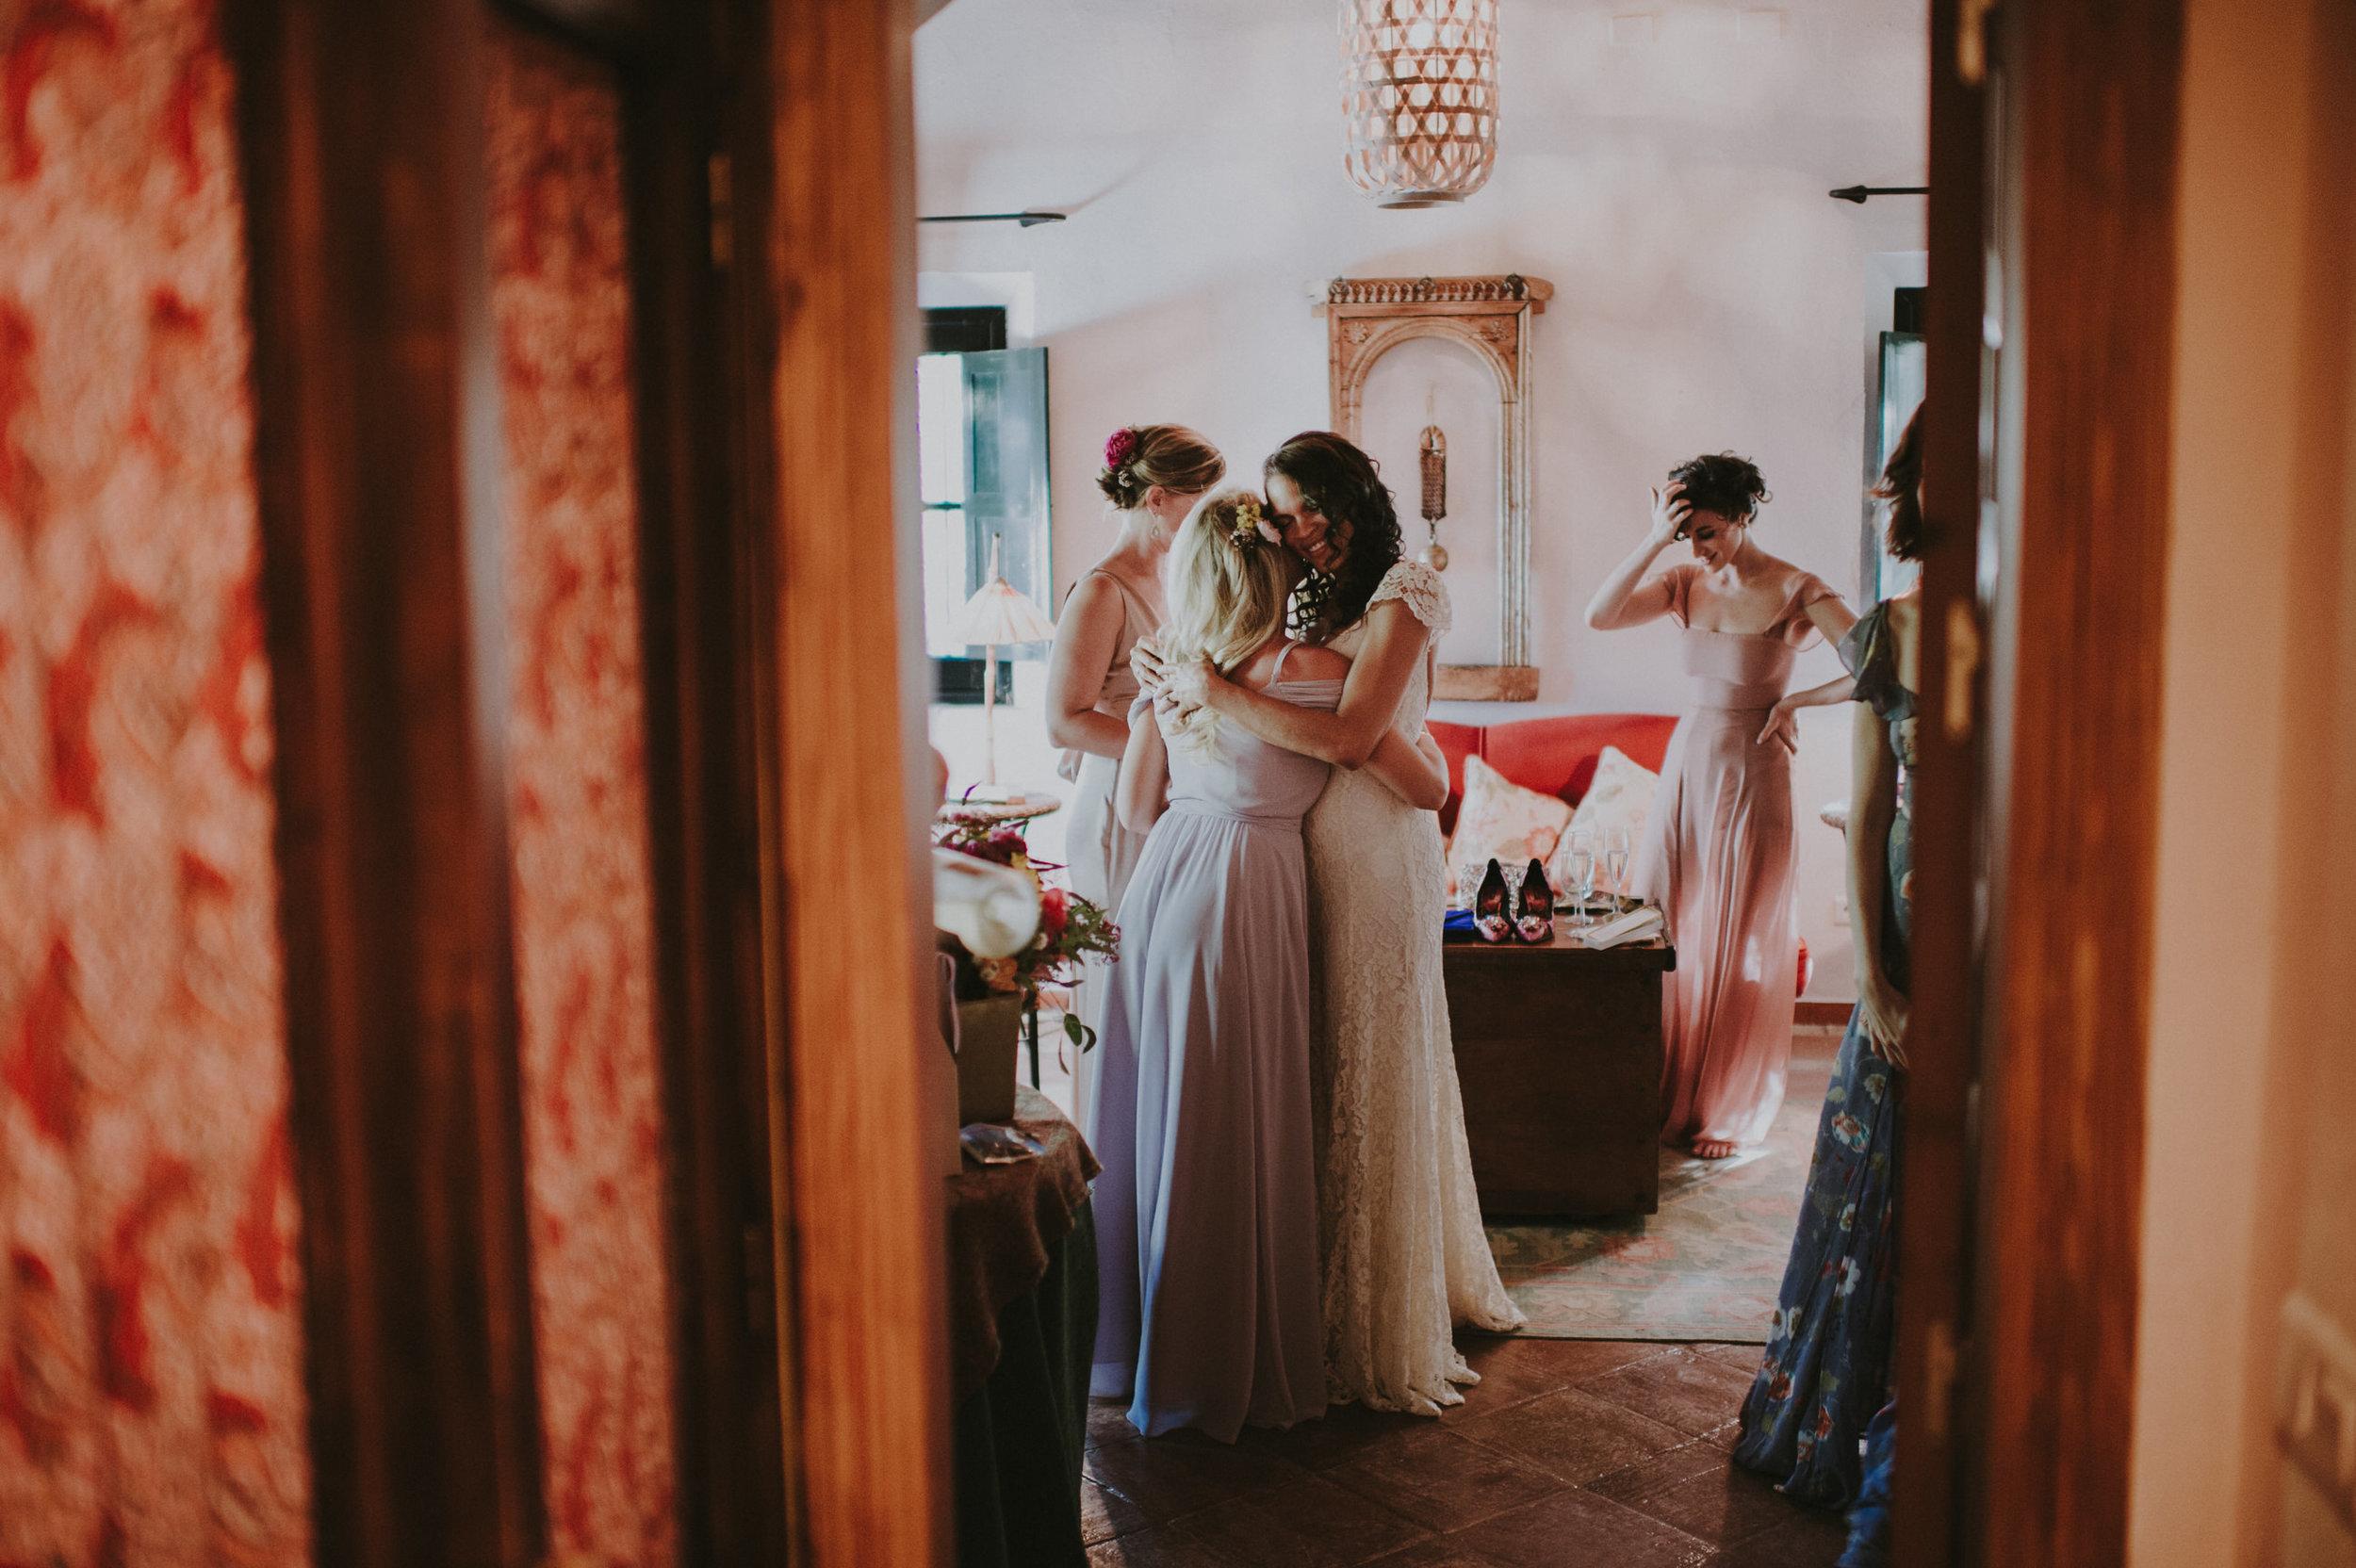 Andres+Amarillo+fotografo+boda+sevilla+natural+sin+poses+hacienda+san+rafael (41).JPG